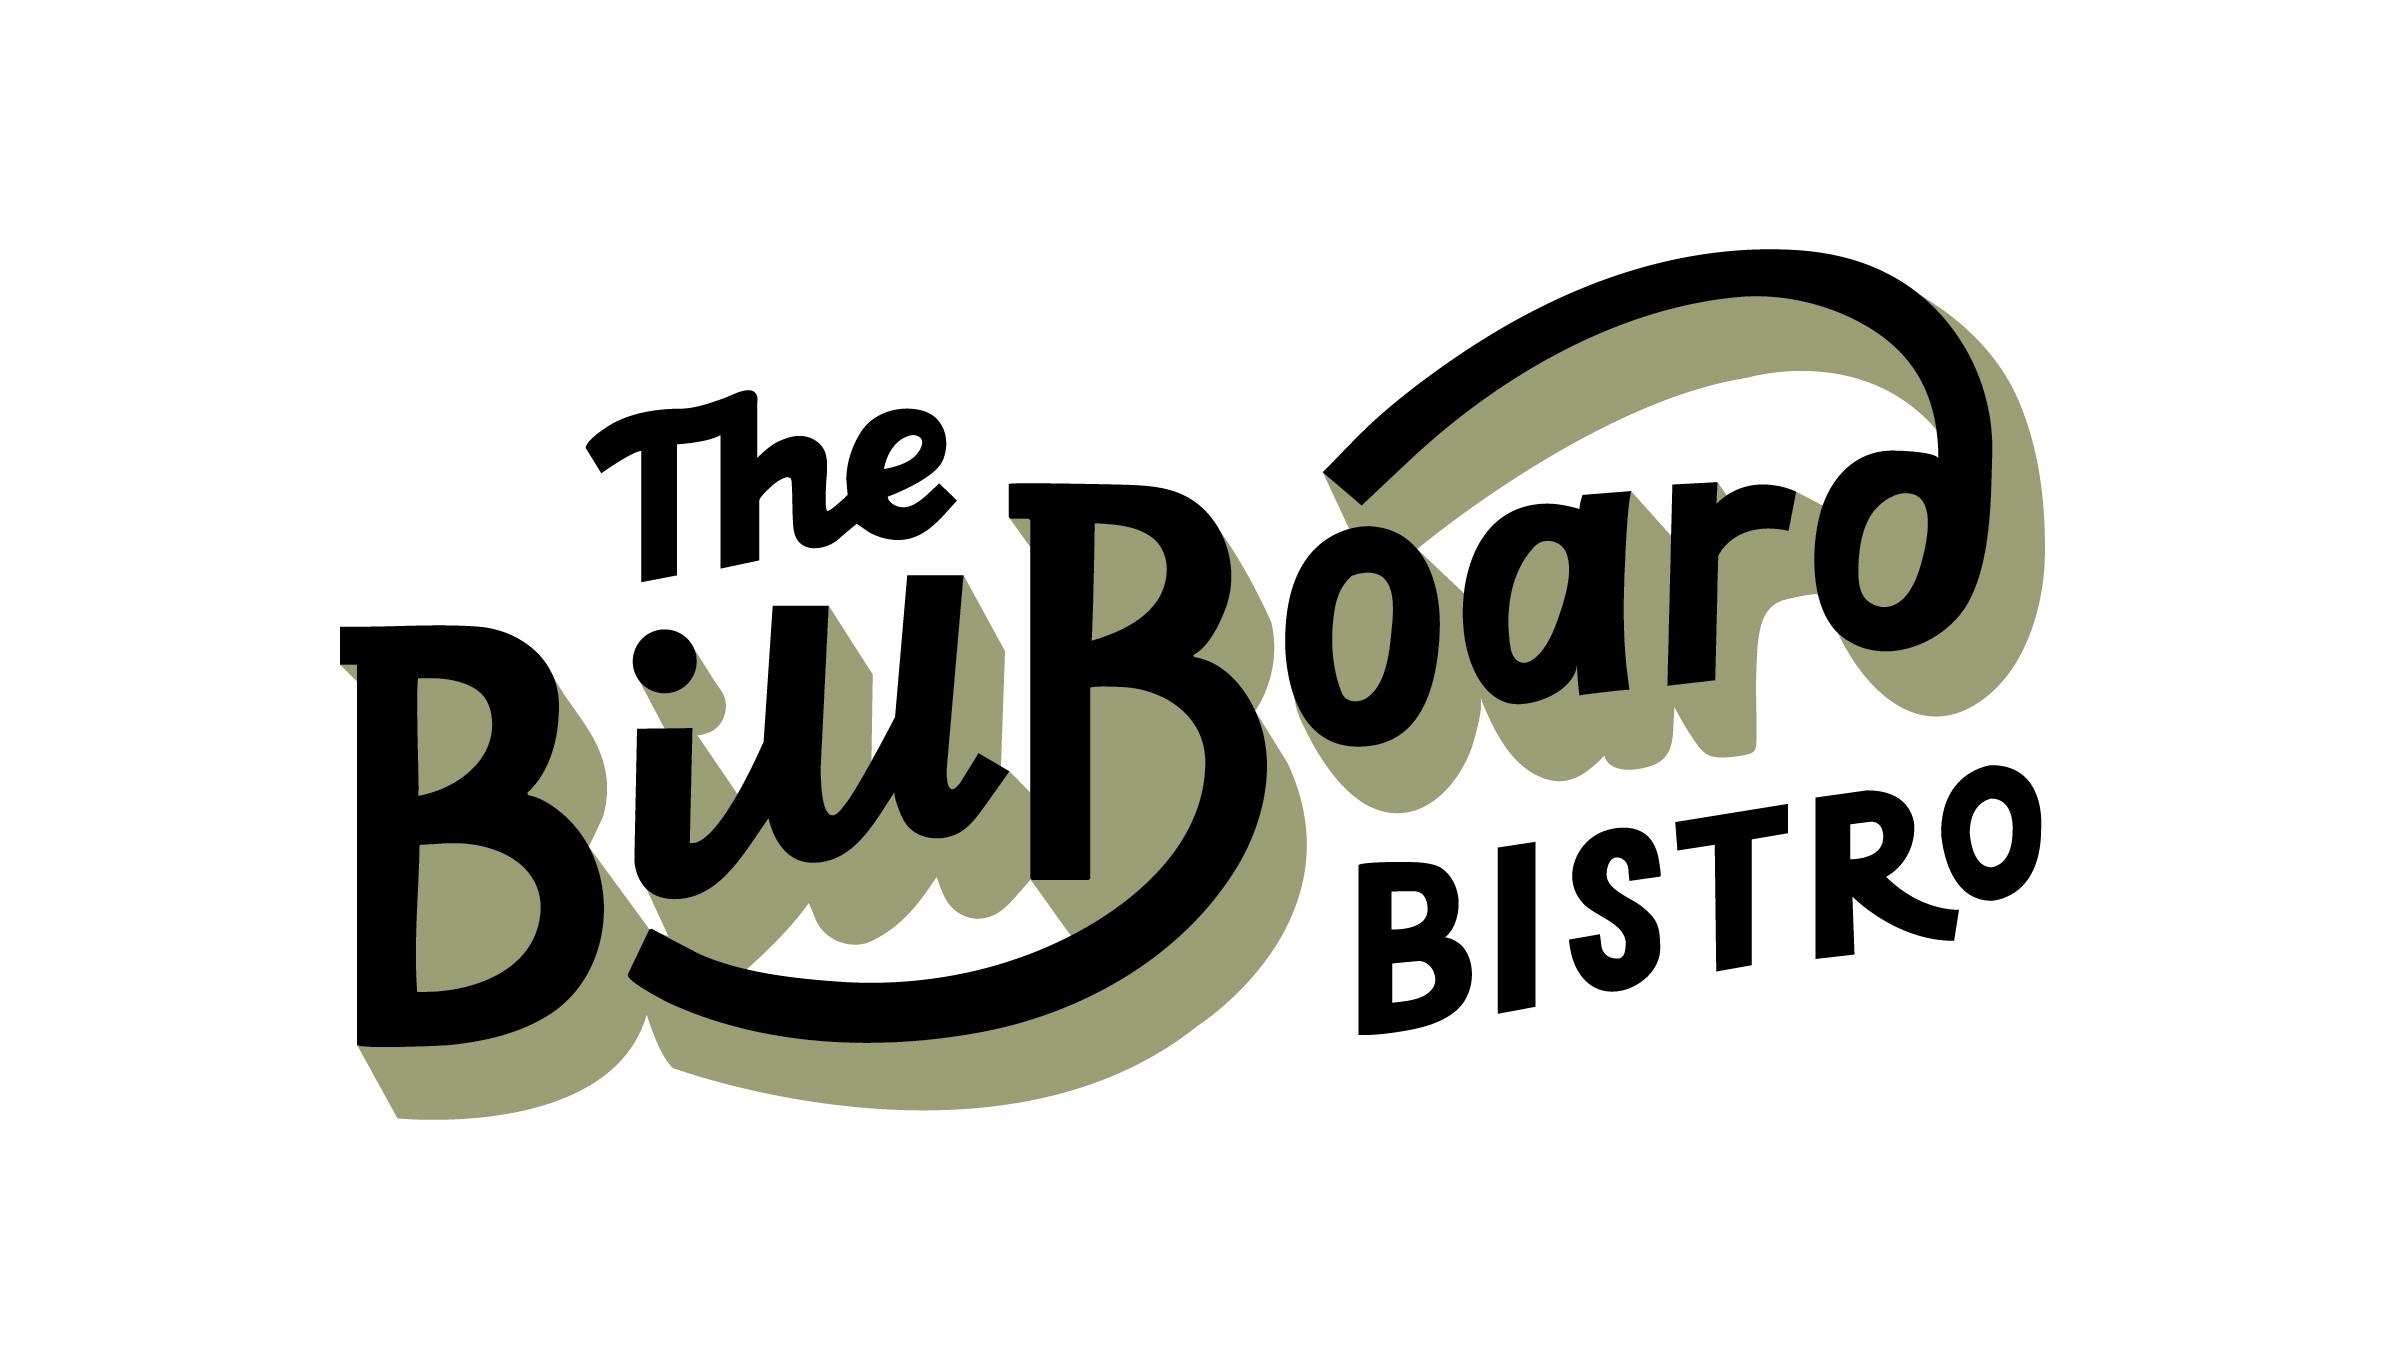 The Billboard Bistro Logo